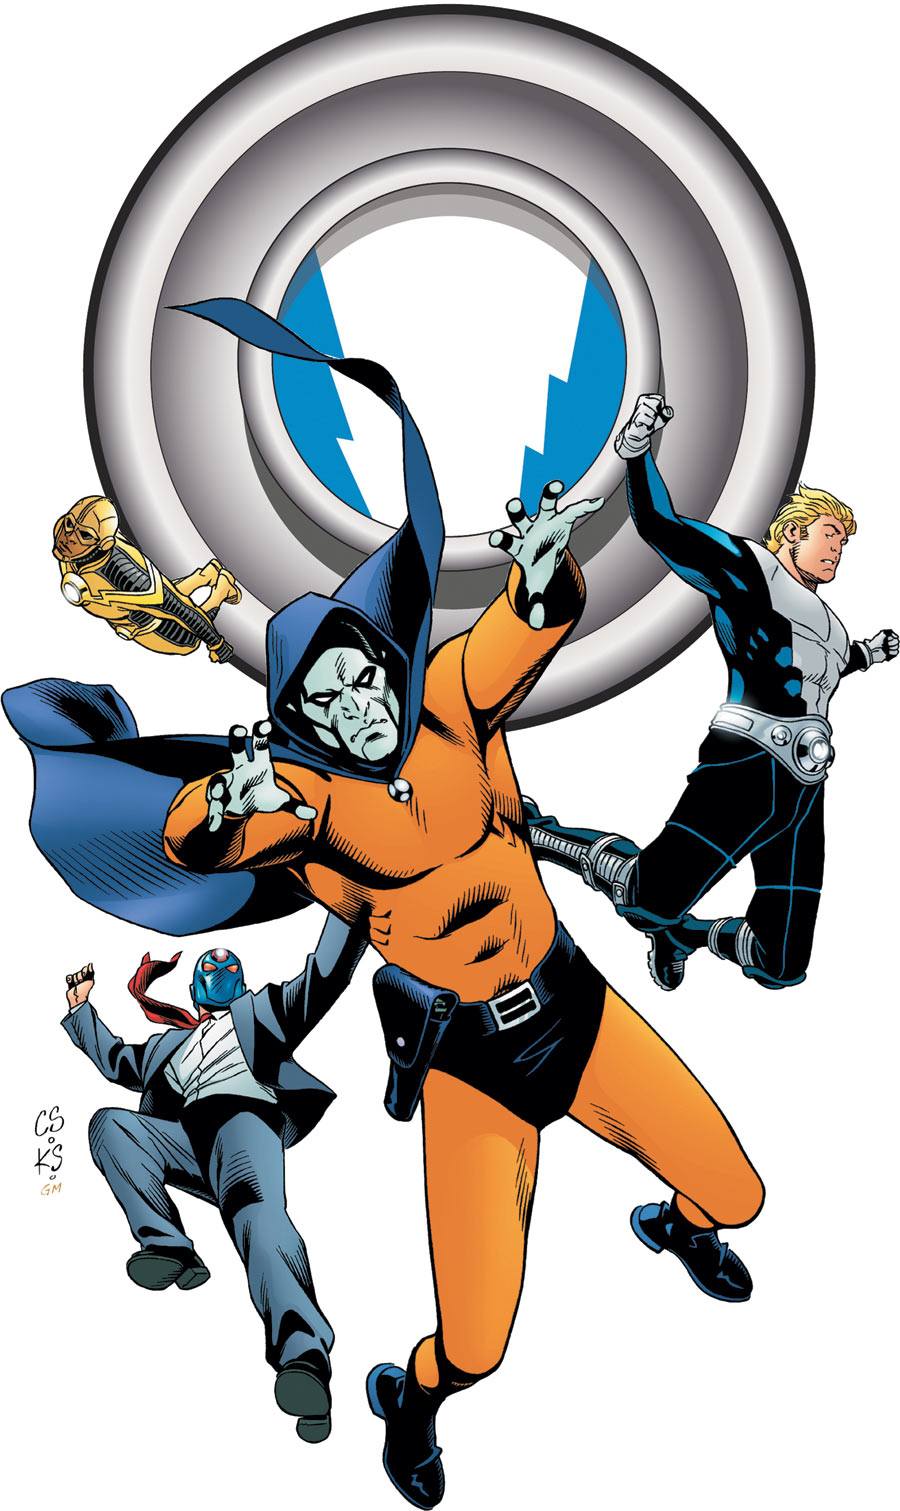 Comix Factory: DC COMICS: I SIMBOLI DEGLI EROI (PARTE 1